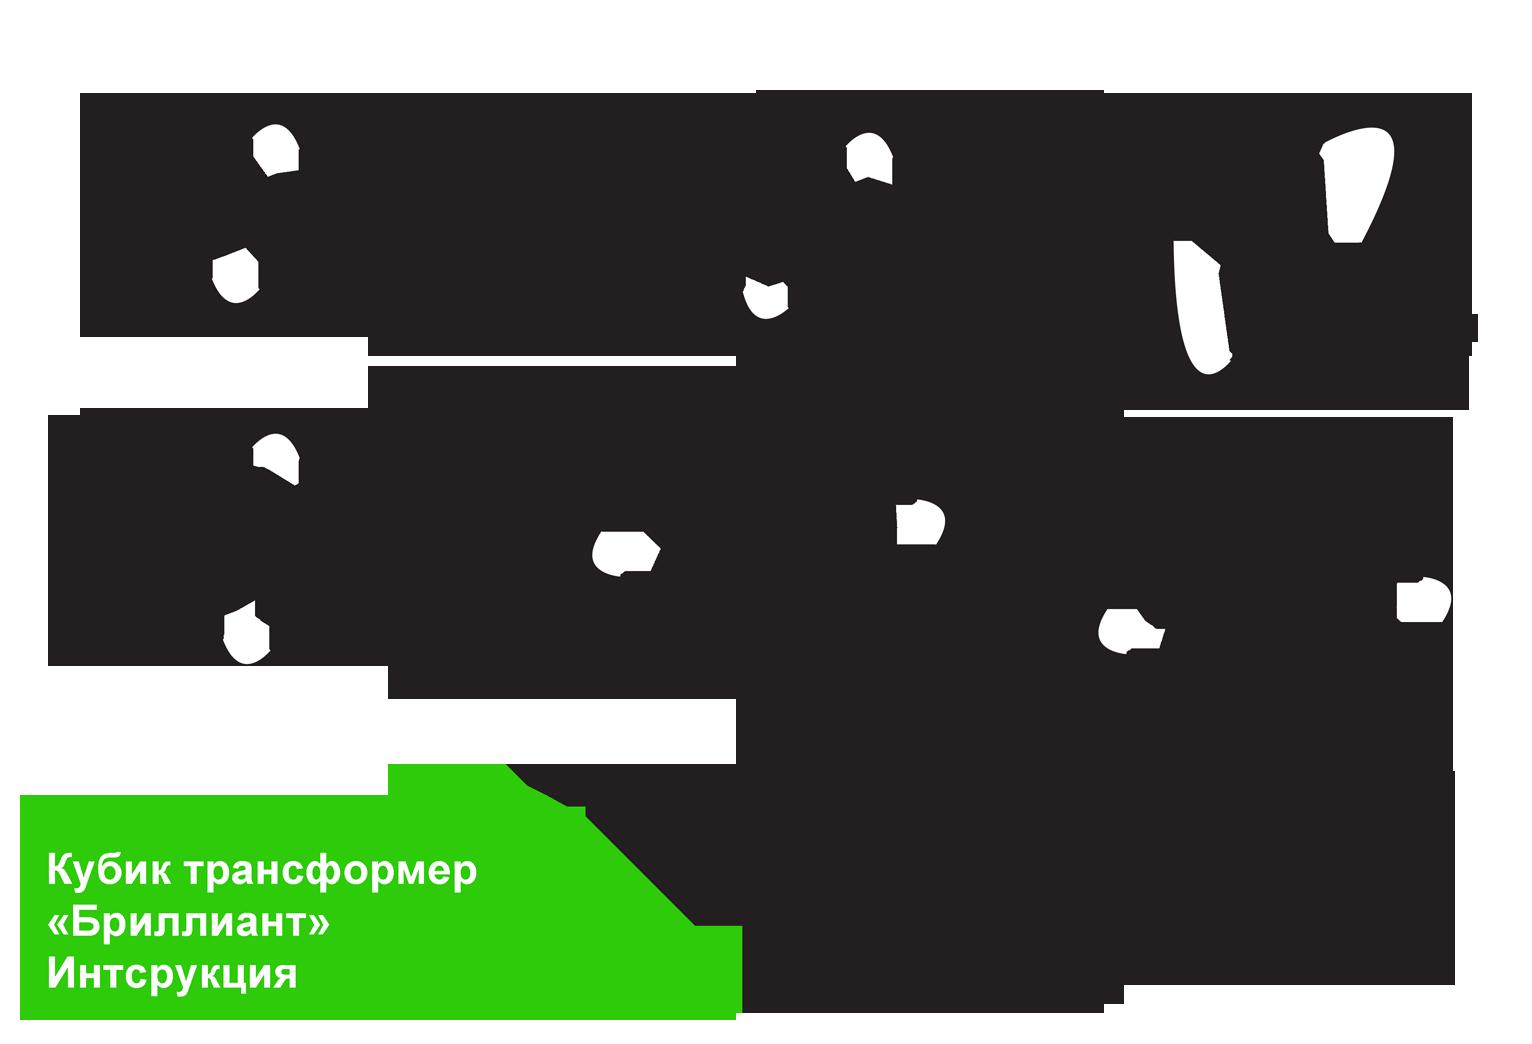 Кубик трансформер схема